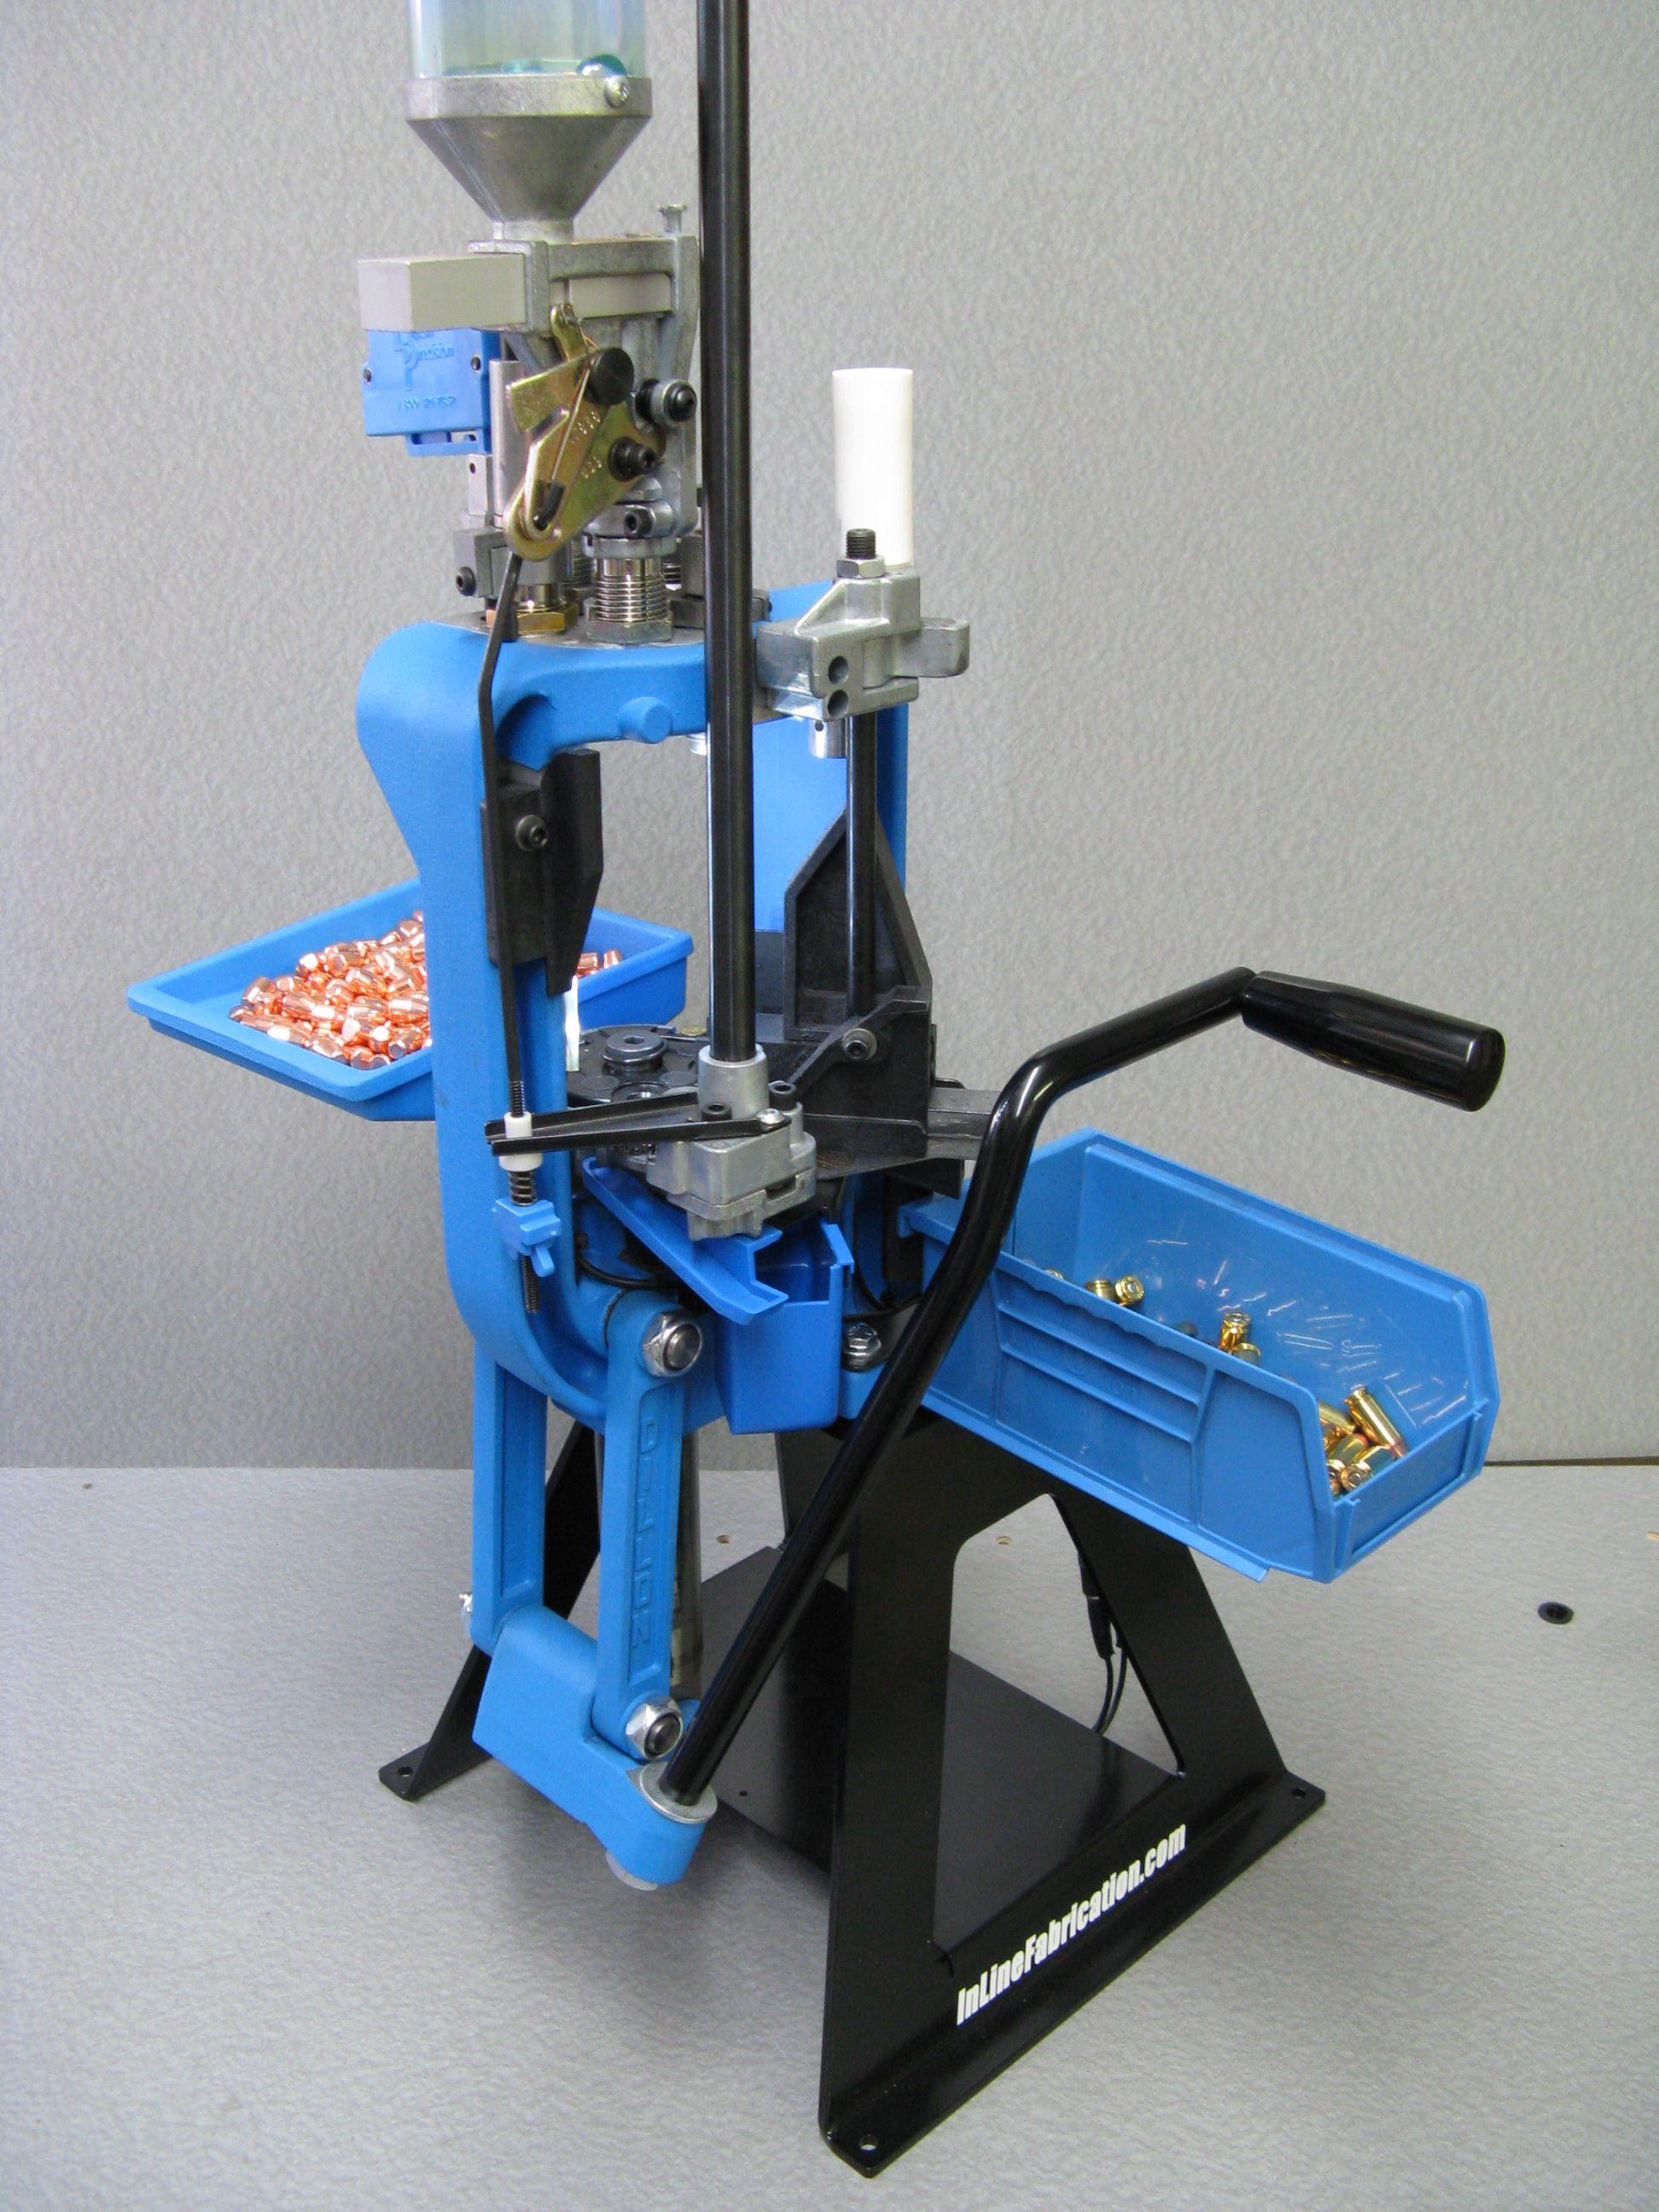 Ultramount press riser system for the Dillon XL 650 / 750